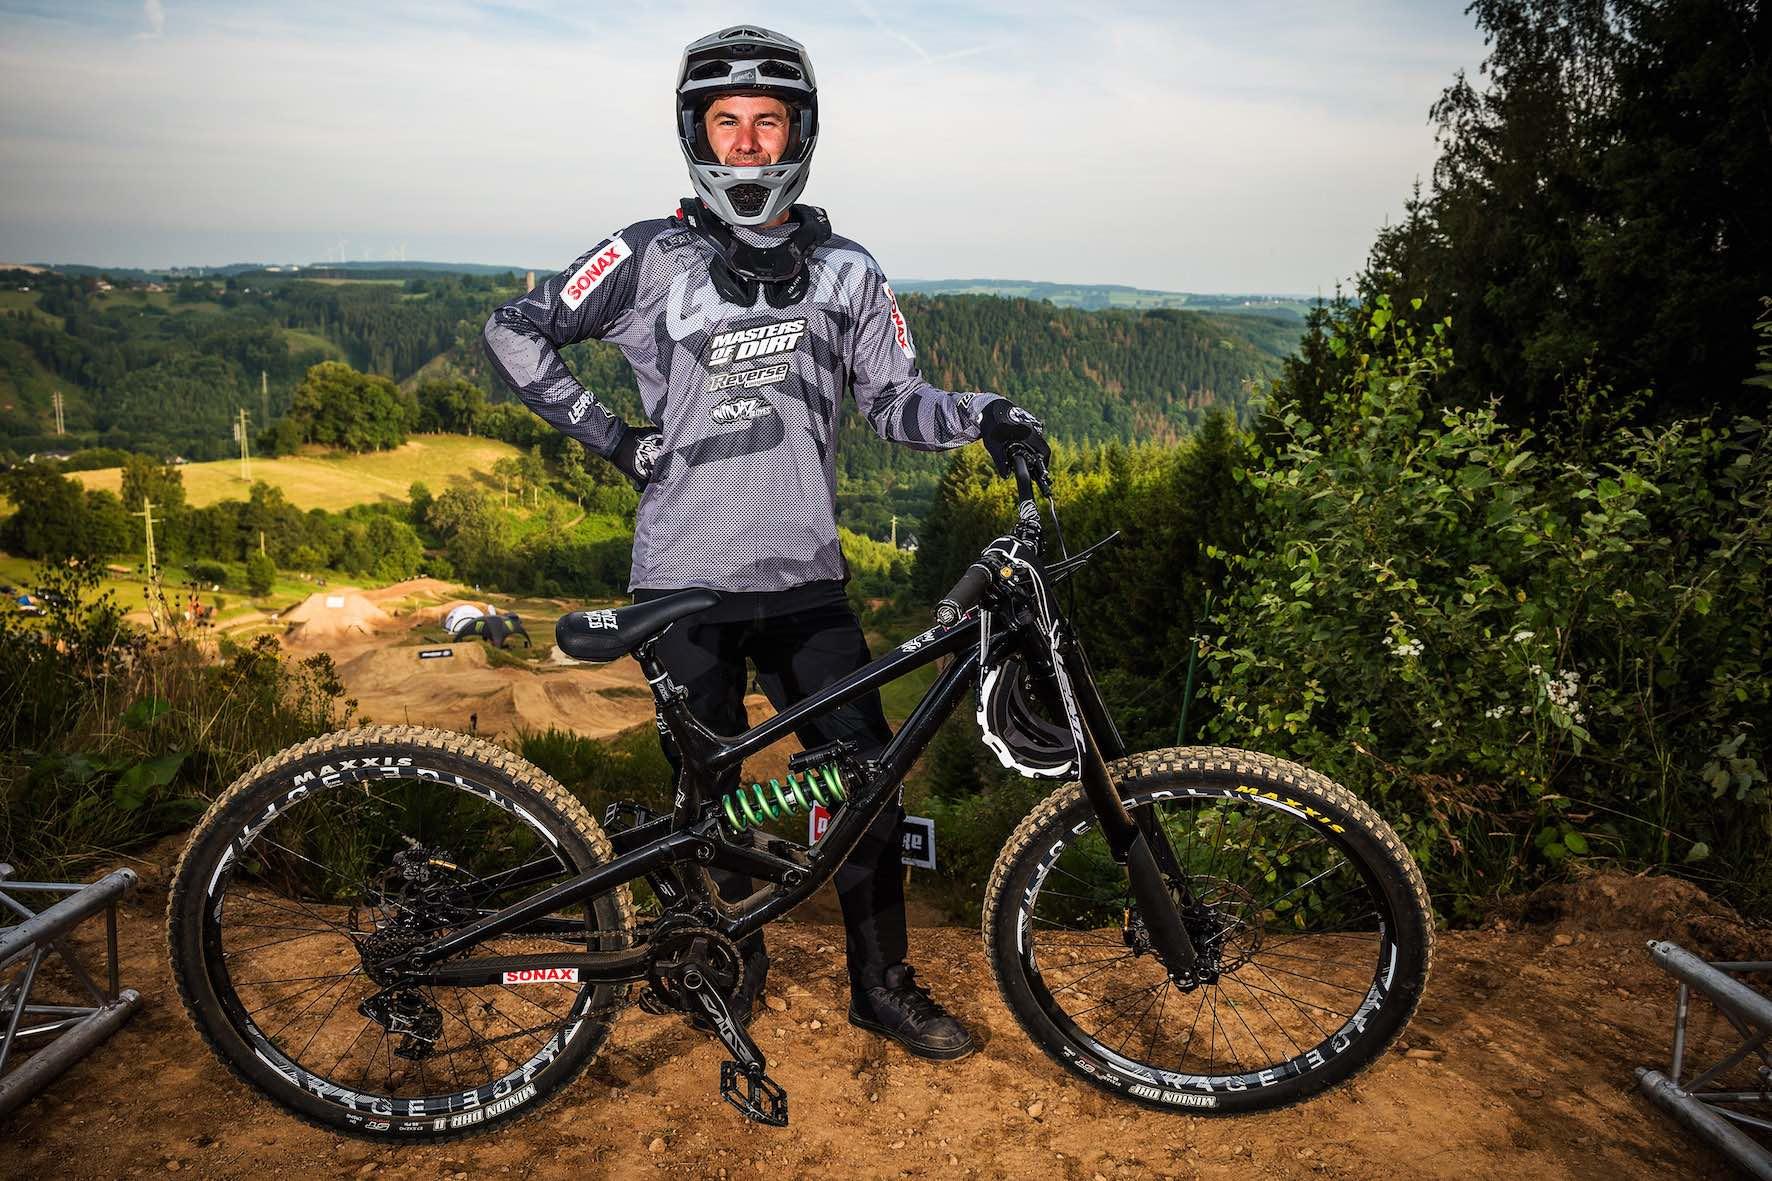 Bikes of Loosefest XL 2019 - Clemens Kaudela on Merida